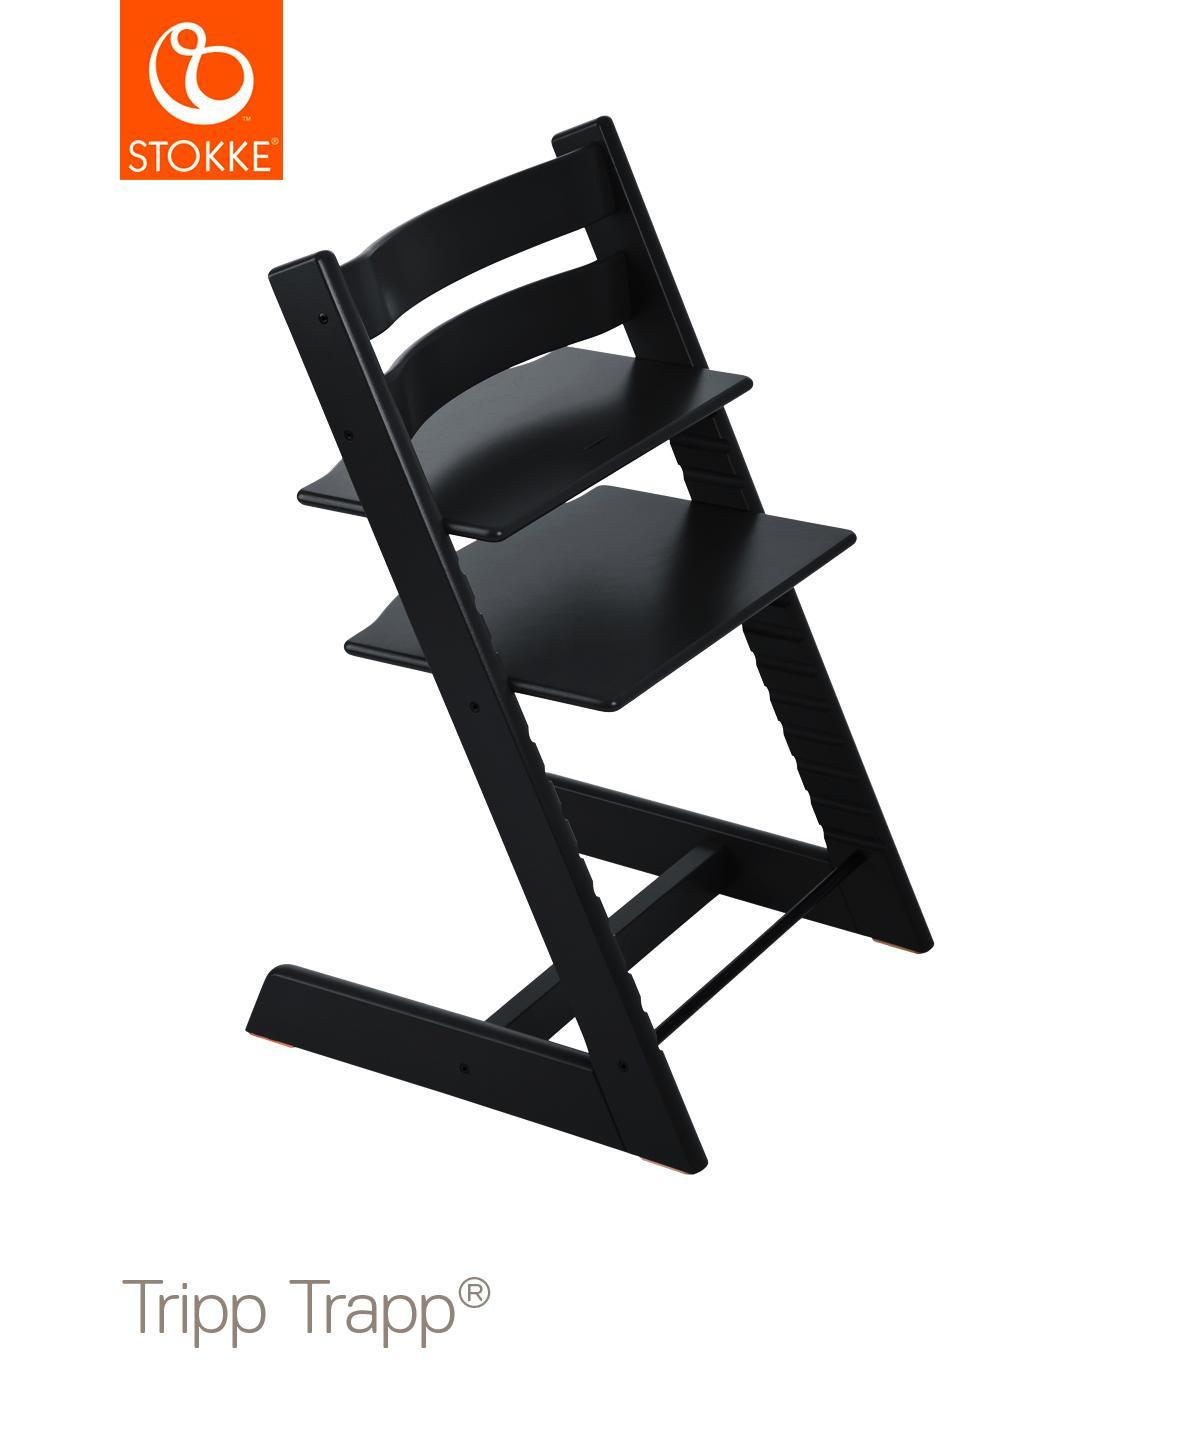 Tripp Trapp - svart, Basics, trä (46/79/49cm) - Stokke